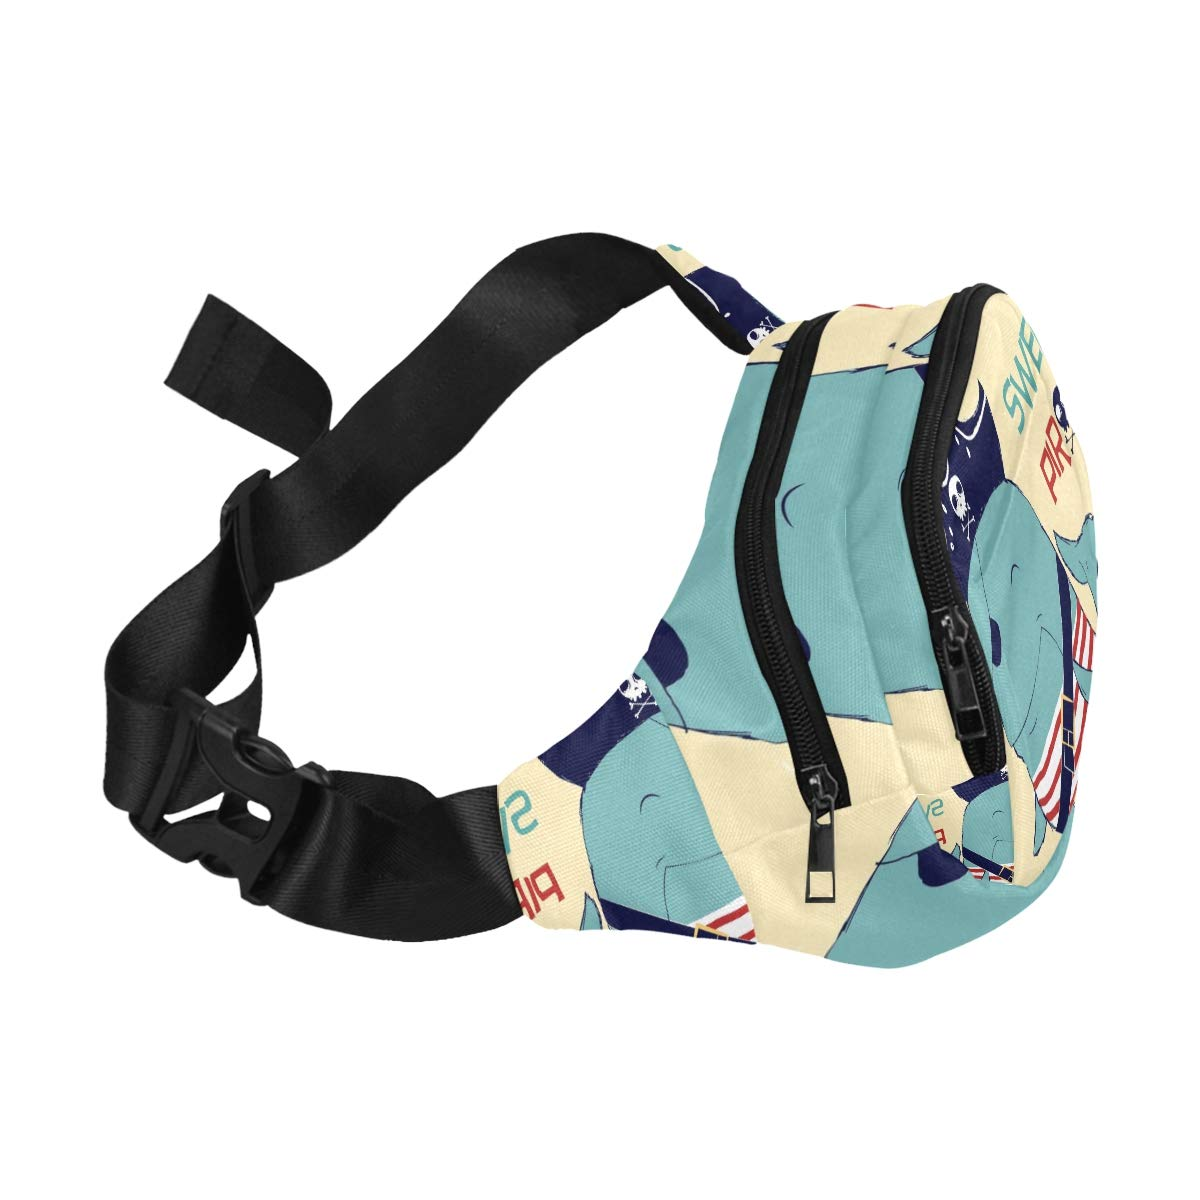 Cartoon Pirate Shark With Shipwreck Fenny Packs Waist Bags Adjustable Belt Waterproof Nylon Travel Running Sport Vacation Party For Men Women Boys Girls Kids